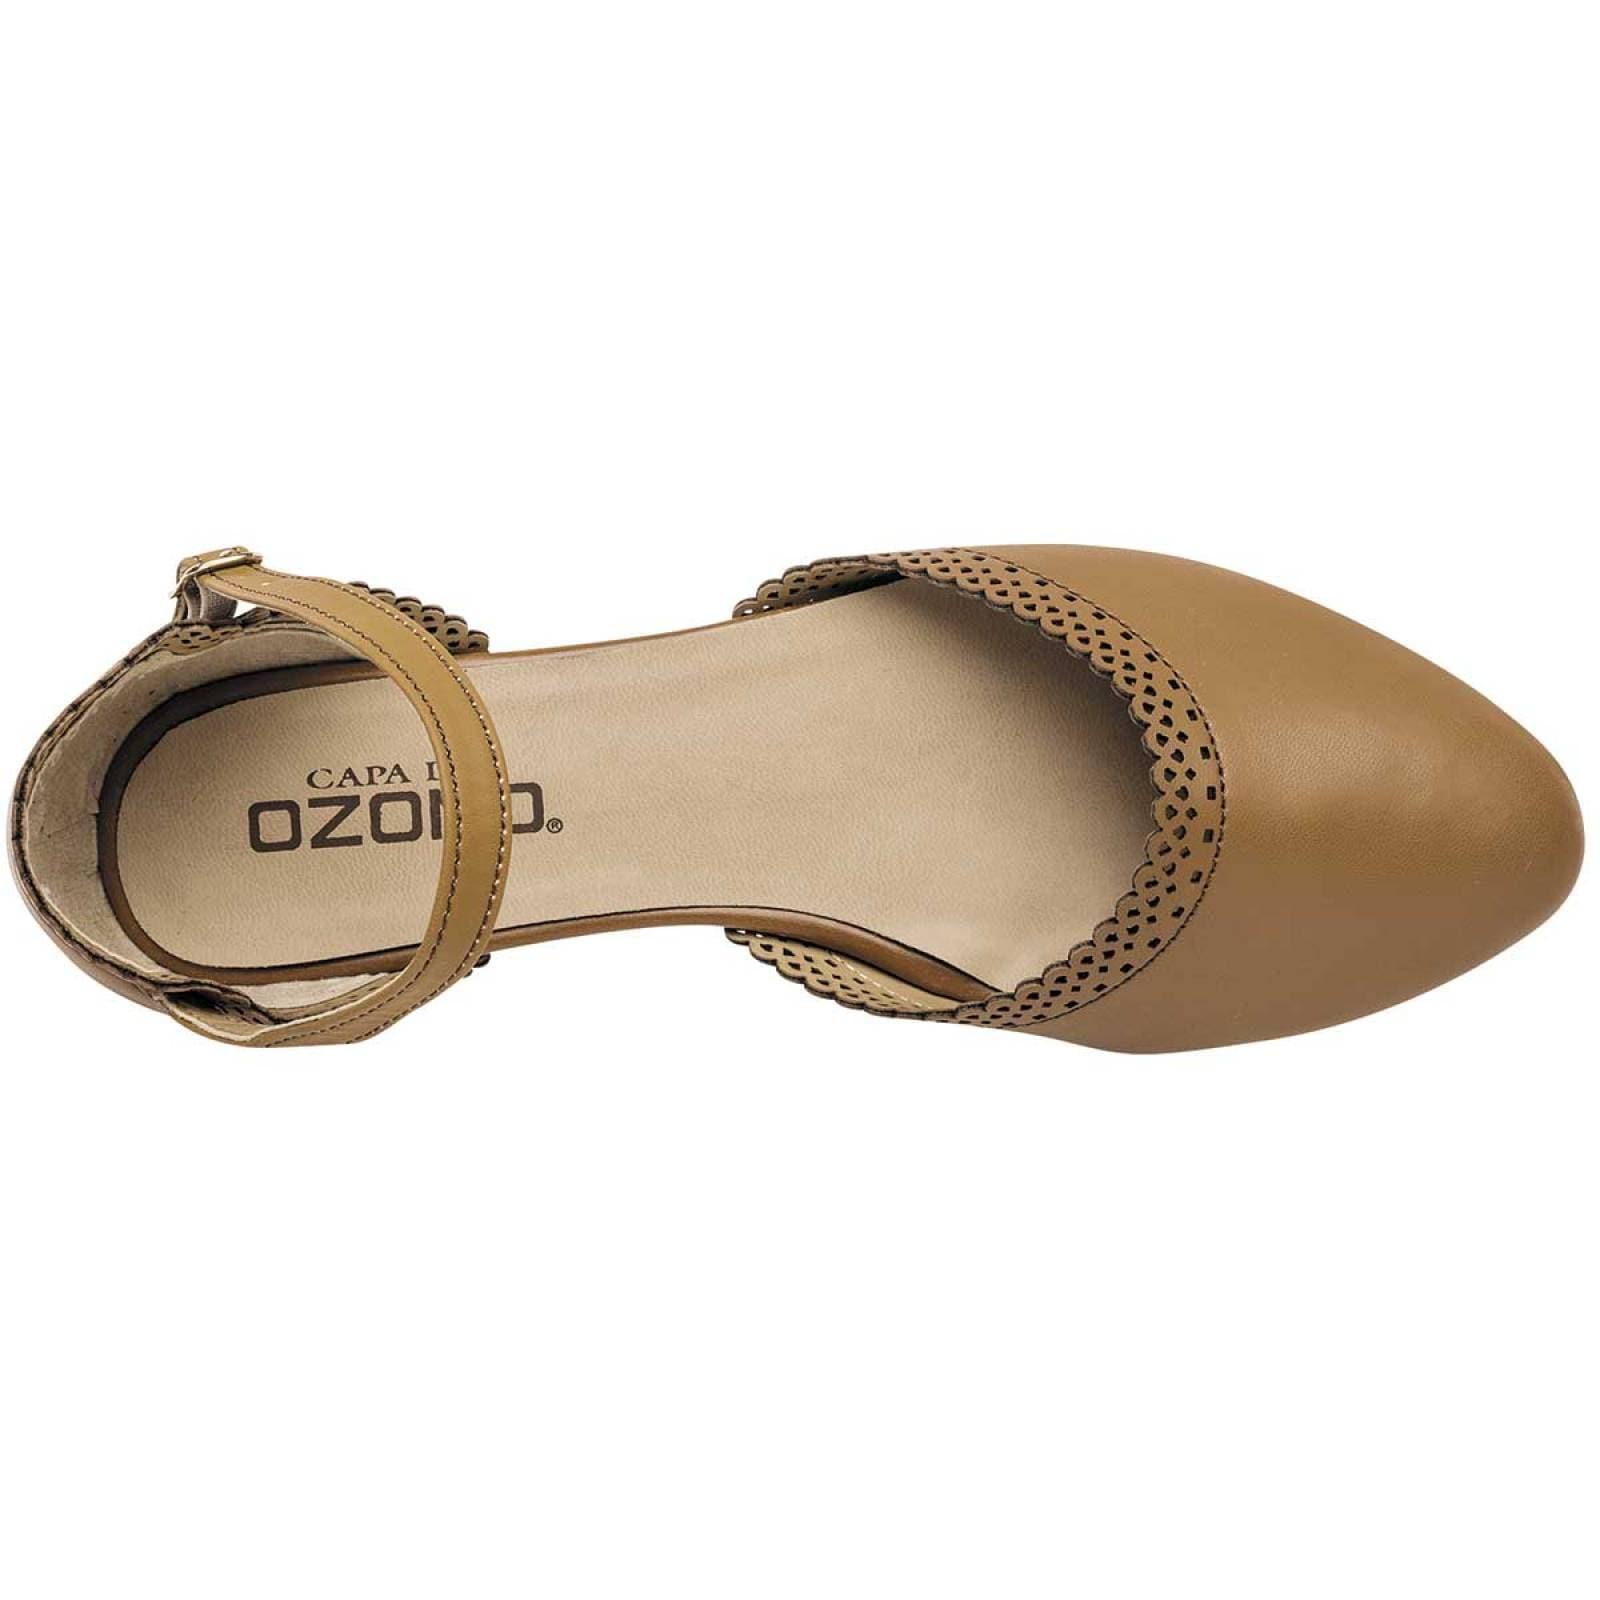 Capa de ozono Zapato Mujer Camel